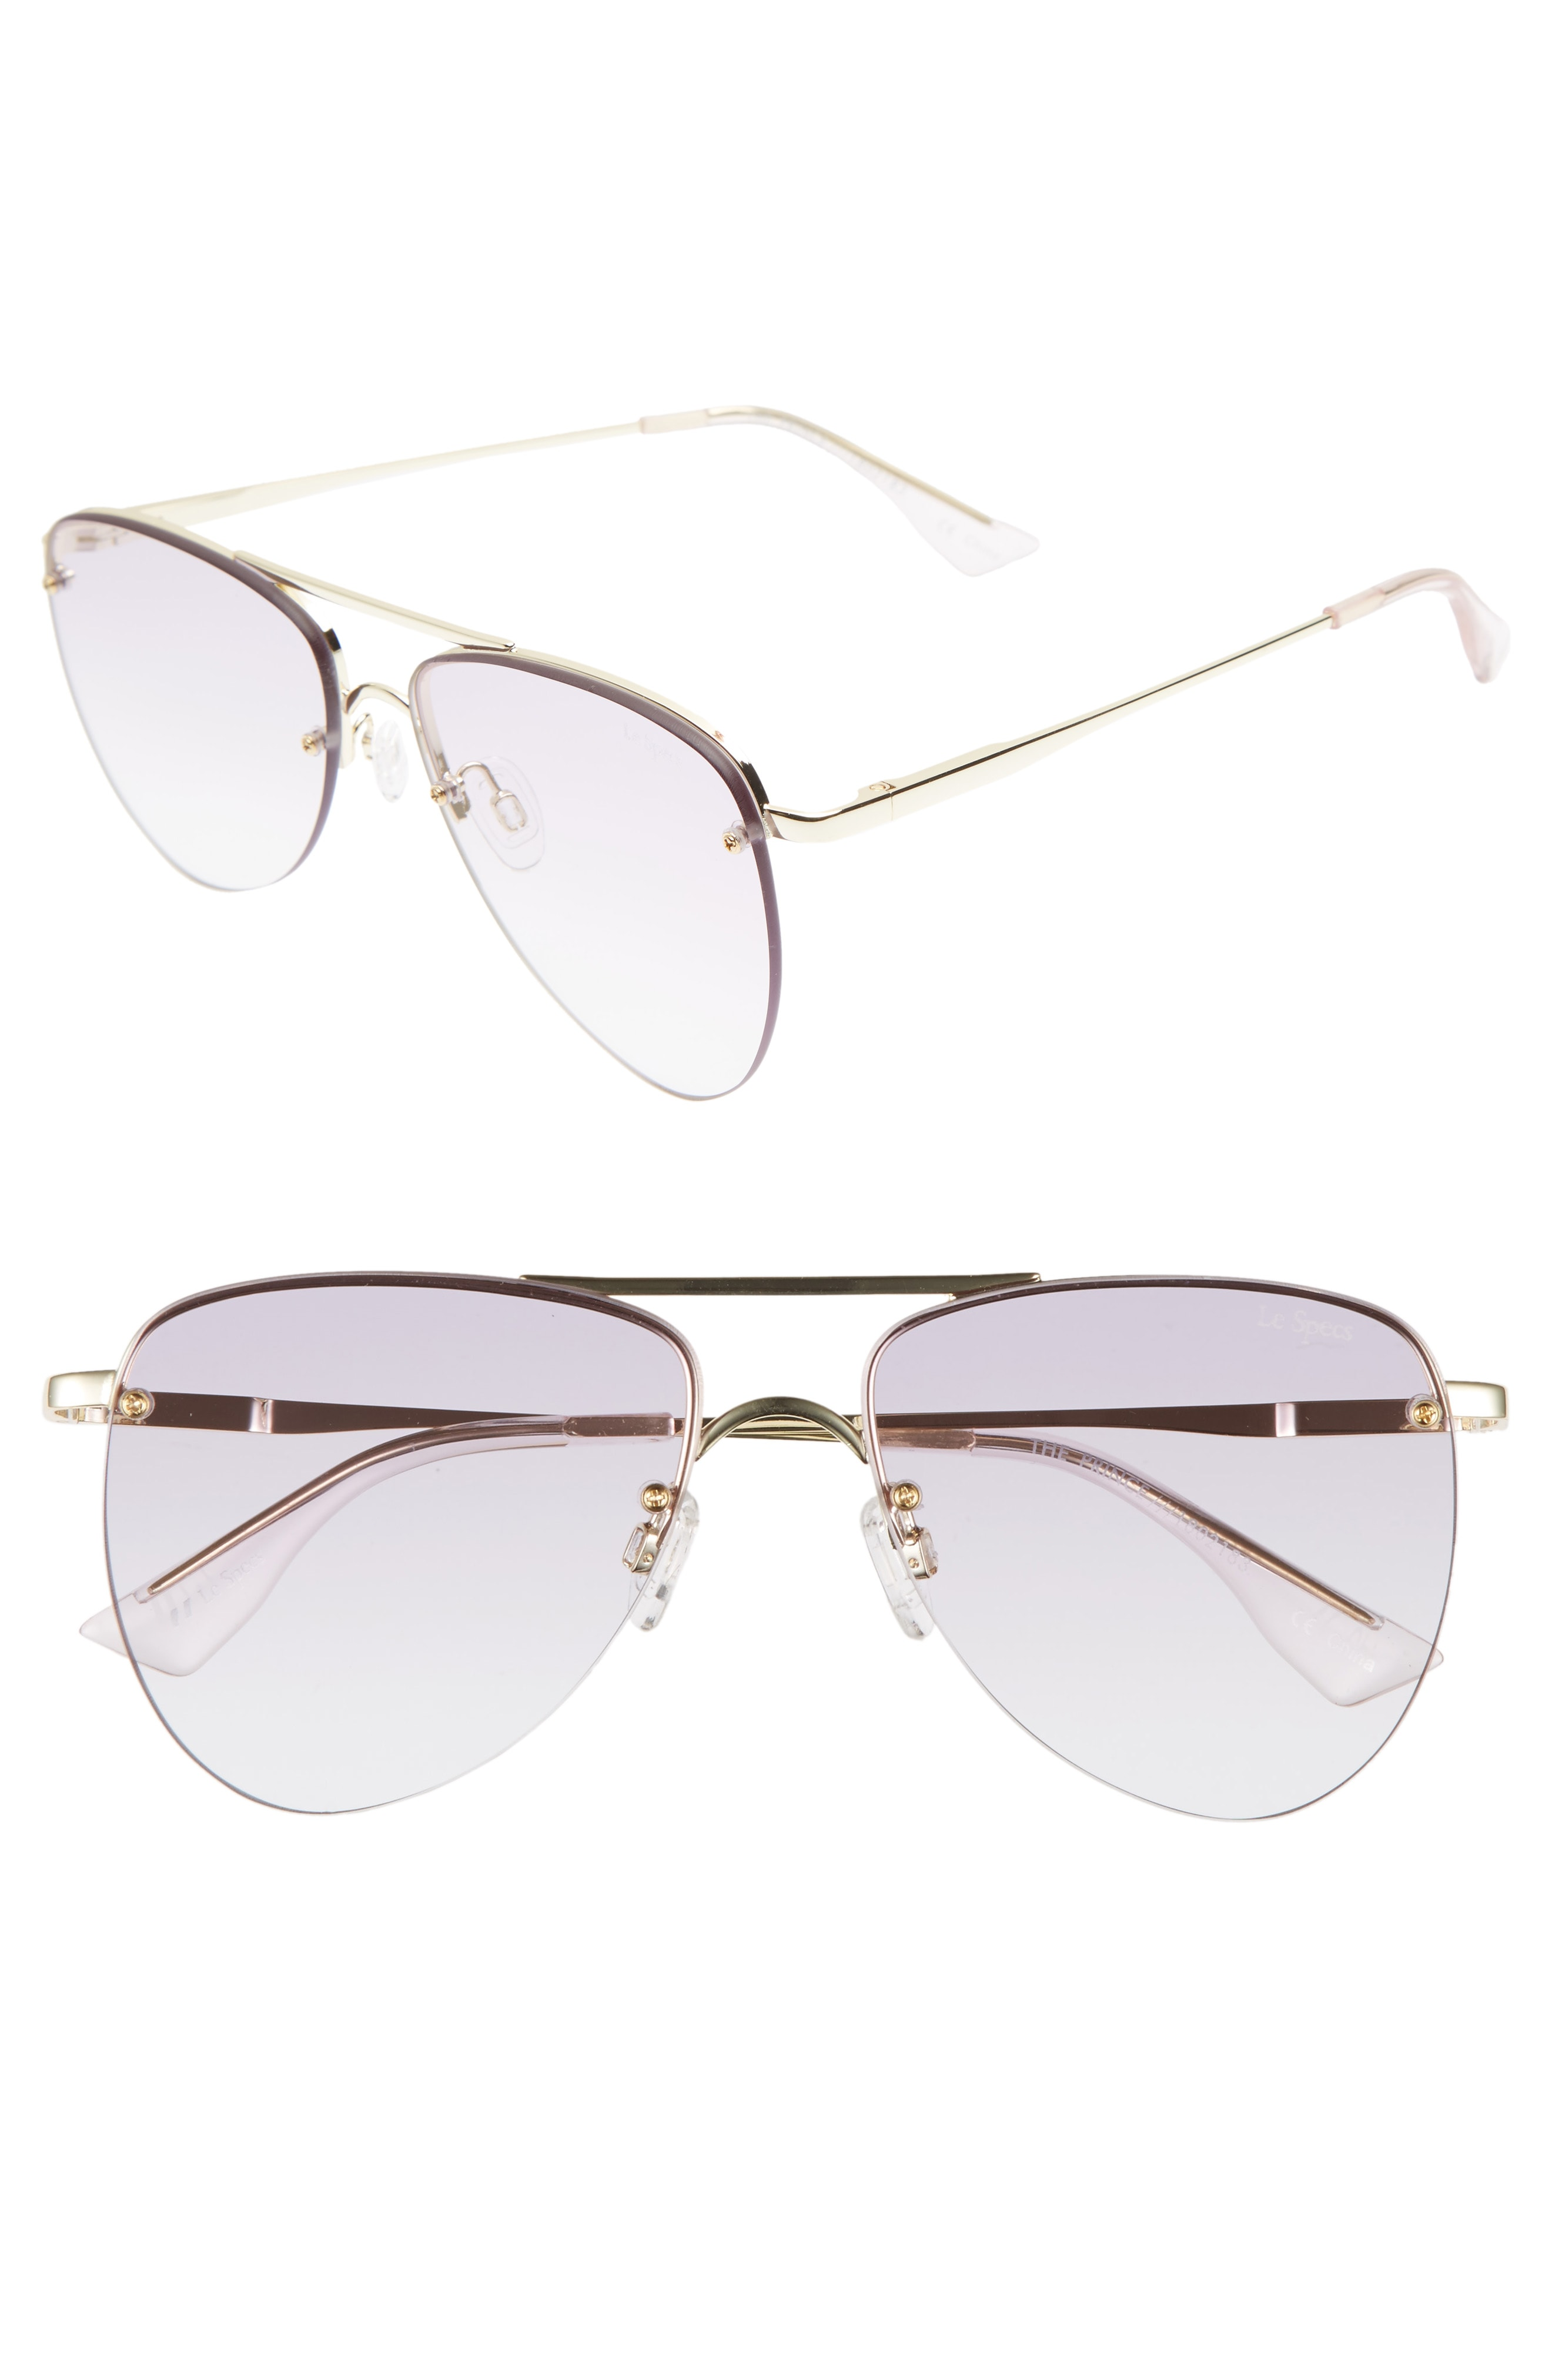 Le Specs The Prince 57mm Aviator Sunglasses